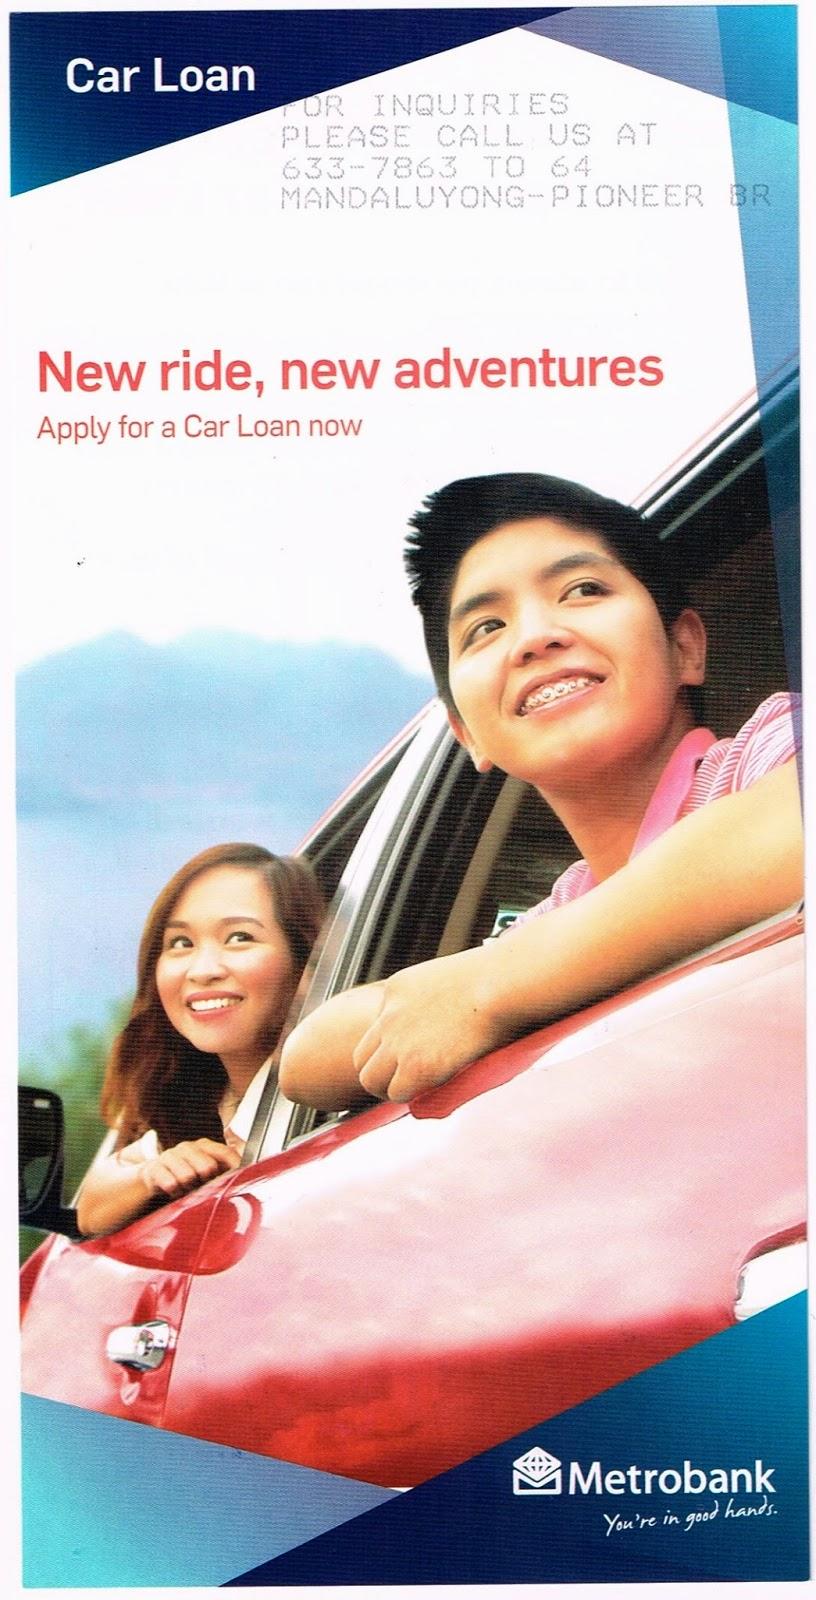 Car Loan Metrobank Rates